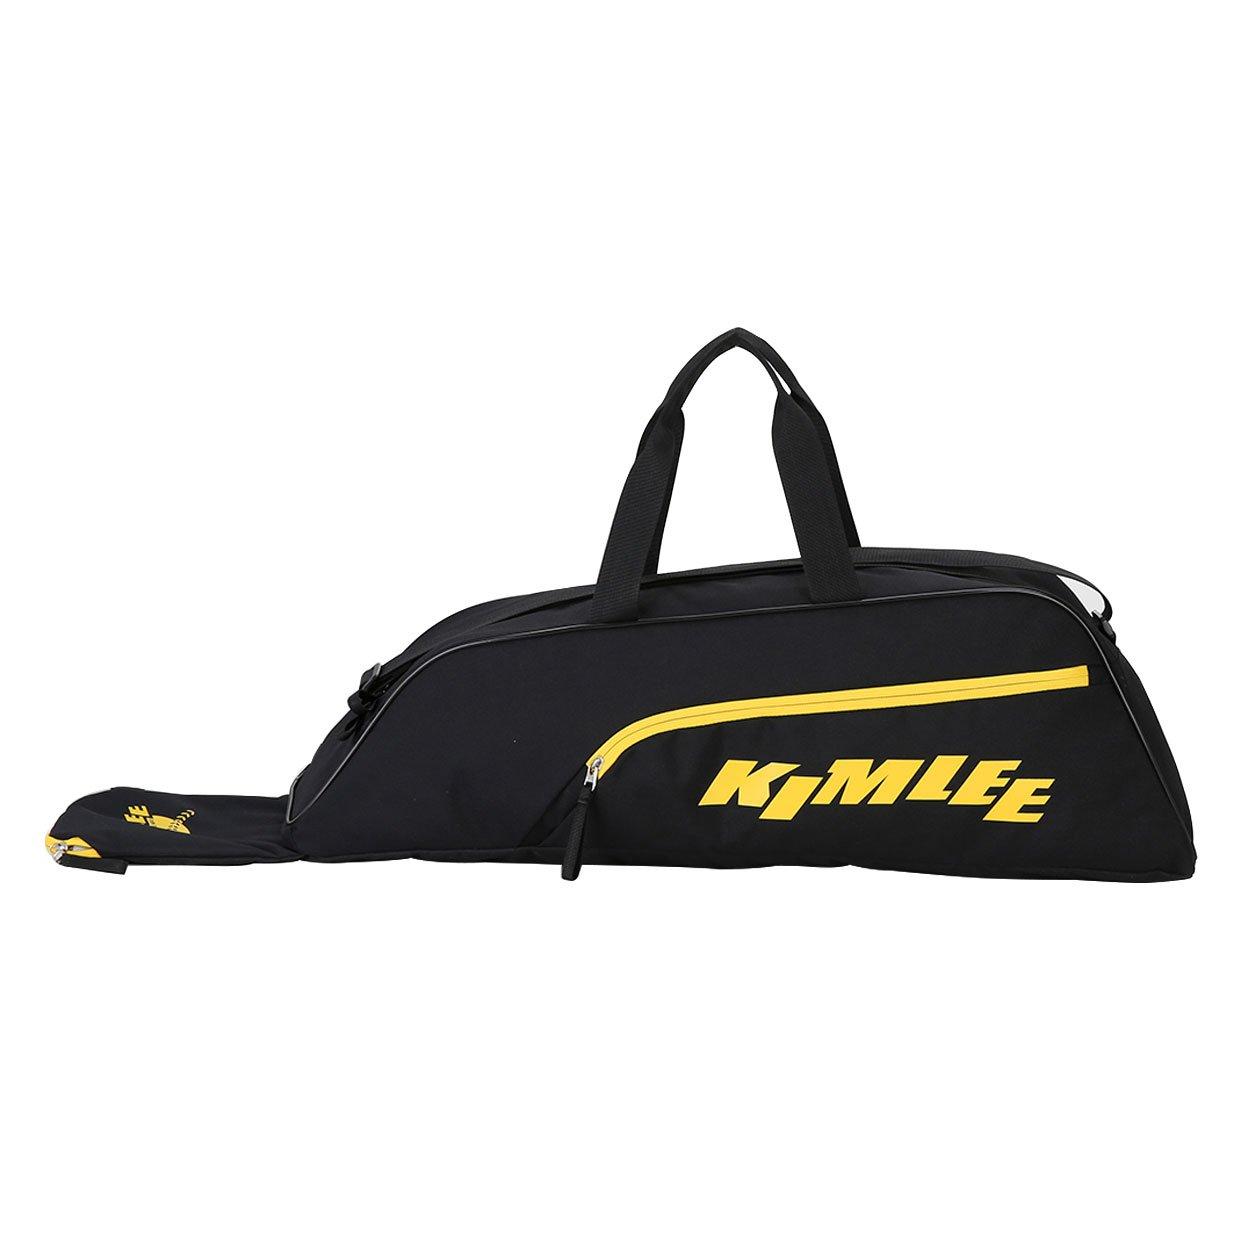 Kimlee Youth Baseball EquipmentsバッグトートバッグDuffle Bags B079B849JC  ブラック